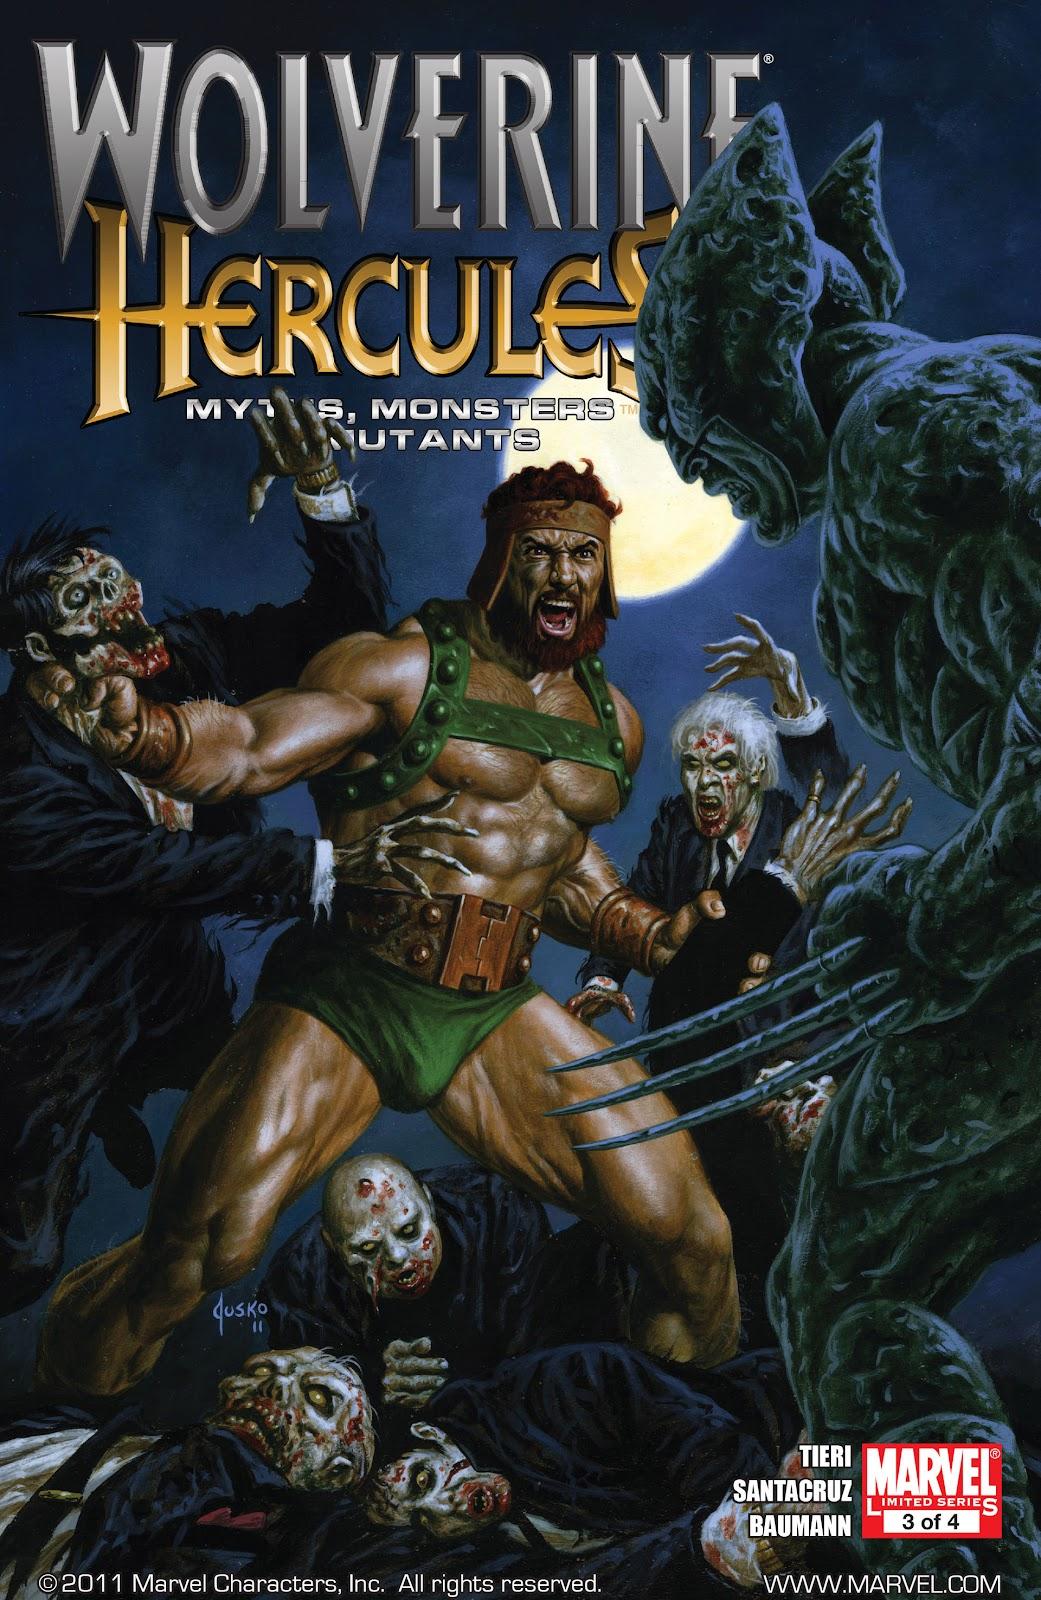 Comic Wolverine/Hercules - Myths, Monsters & Mutants issue 3